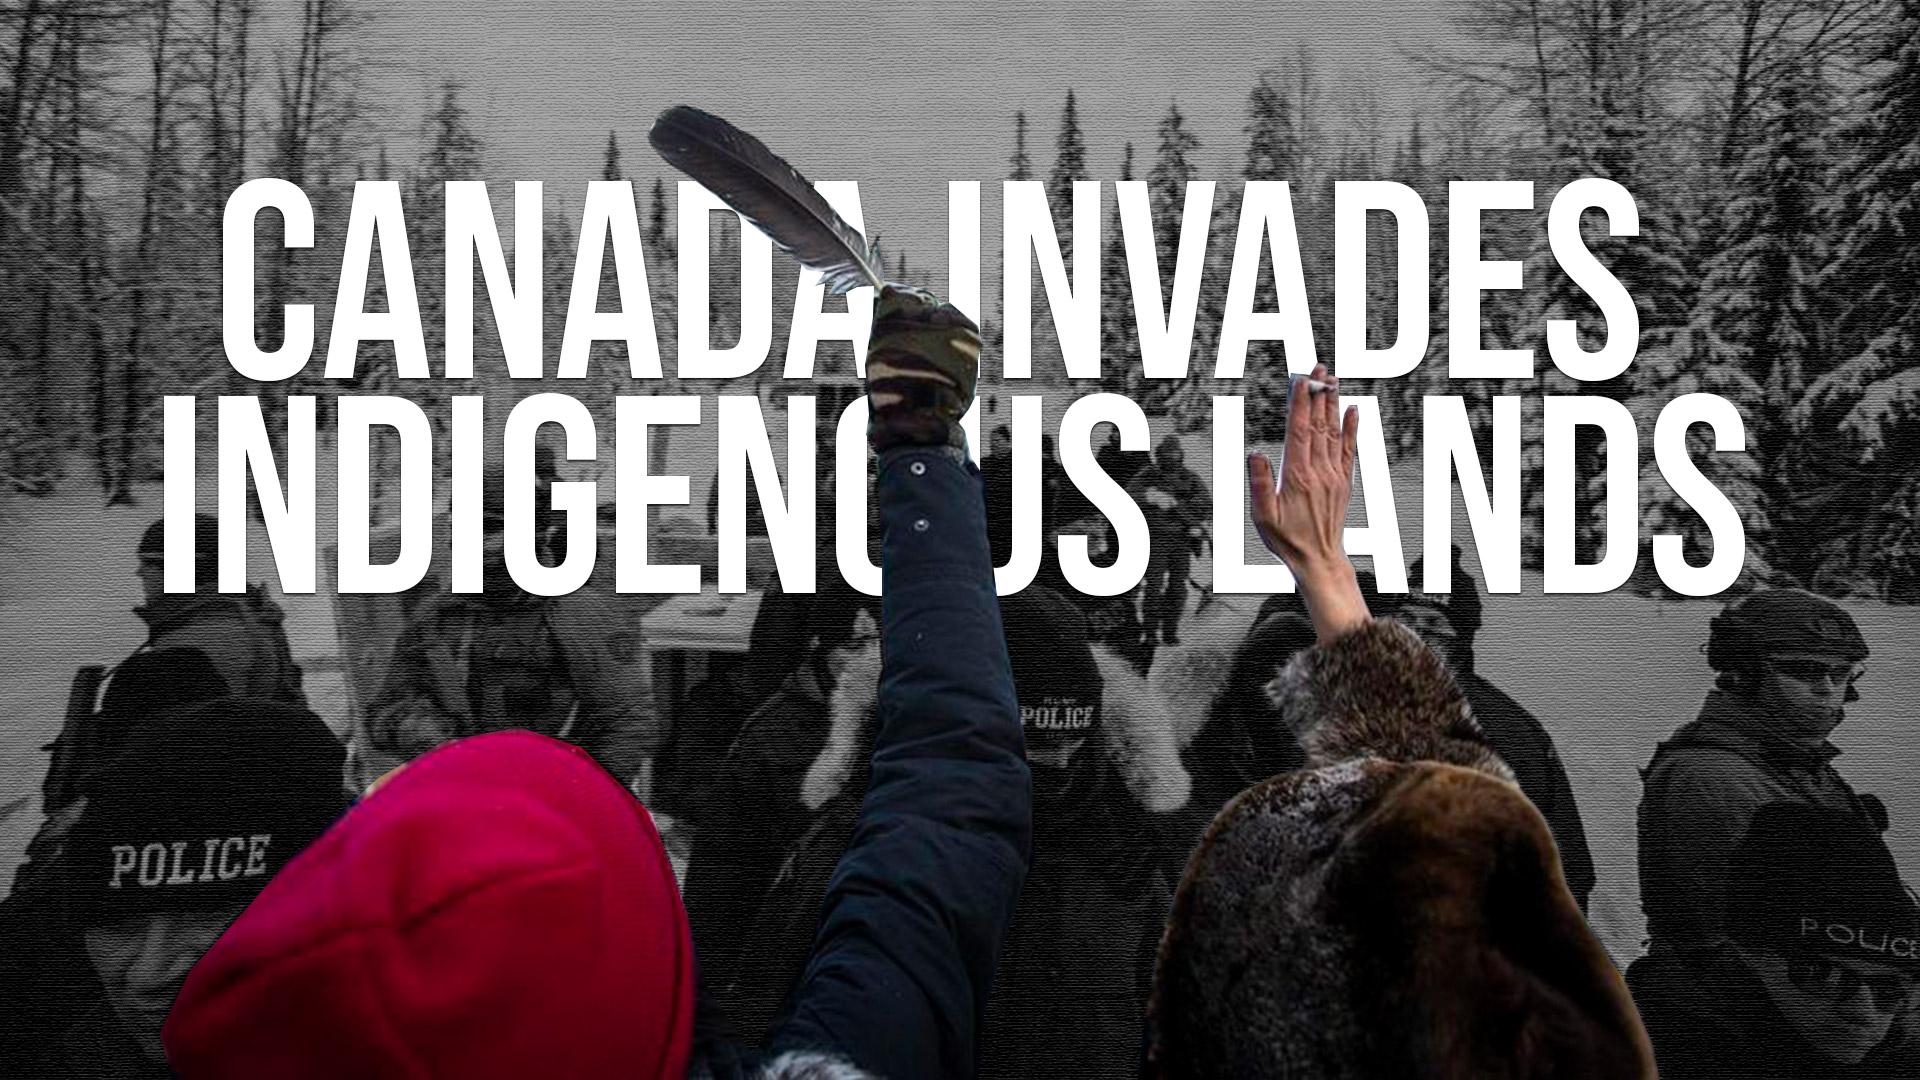 Canada Invades Indigenous Lands